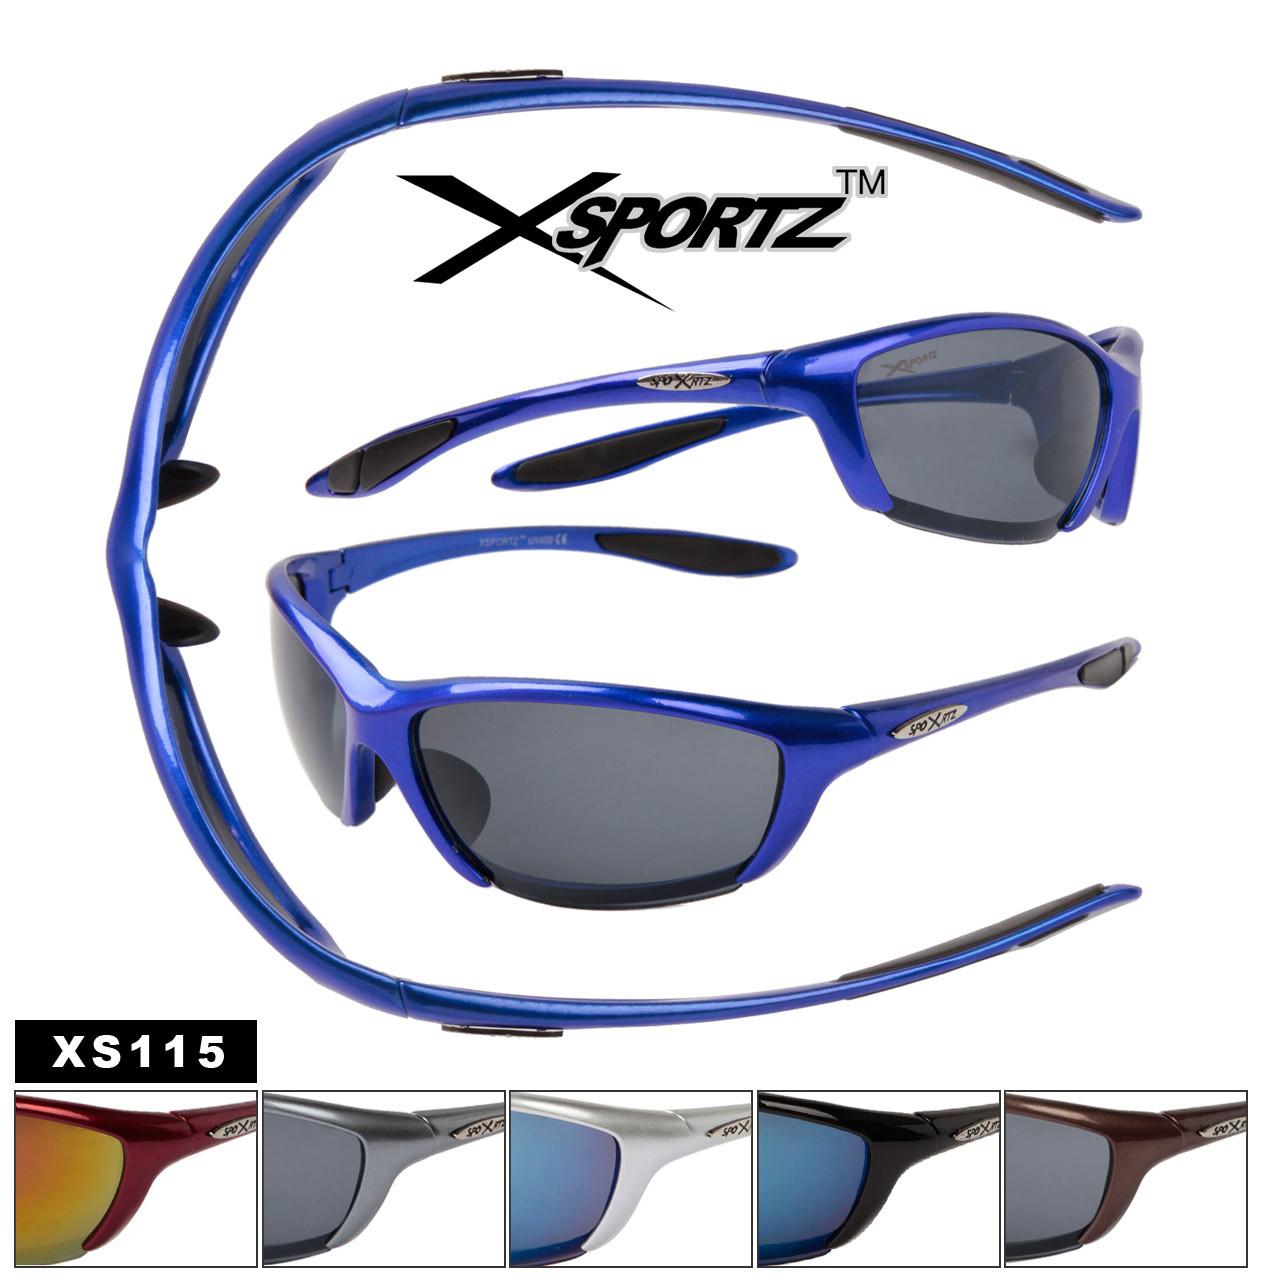 Xsportz Sports Sunglasses XS115 (Assorted Colors) (12 pcs.)